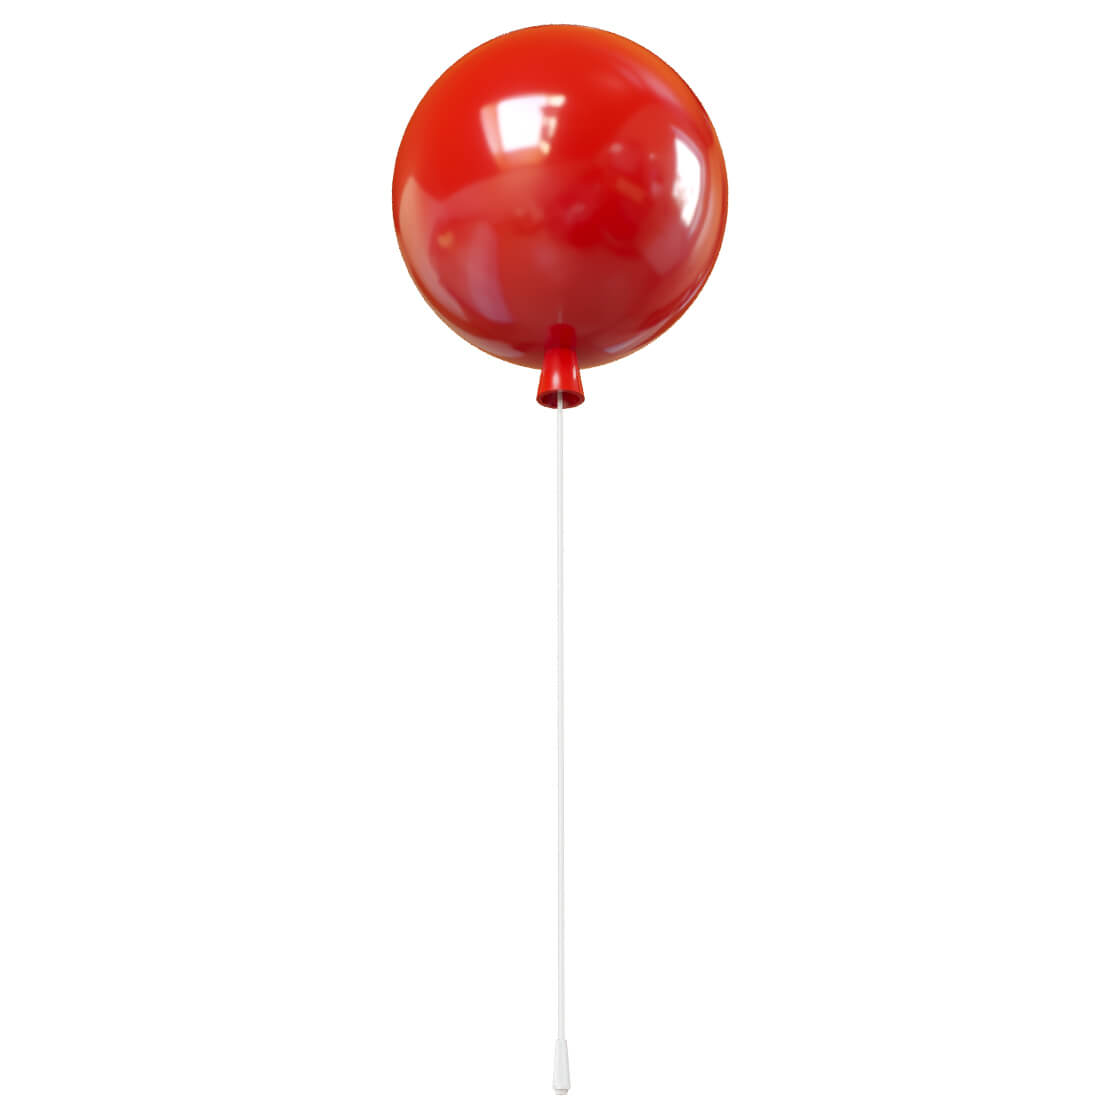 Светильник Loft IT 5055C/M red 5055 red светильник loft it 5055c s red 5055 red